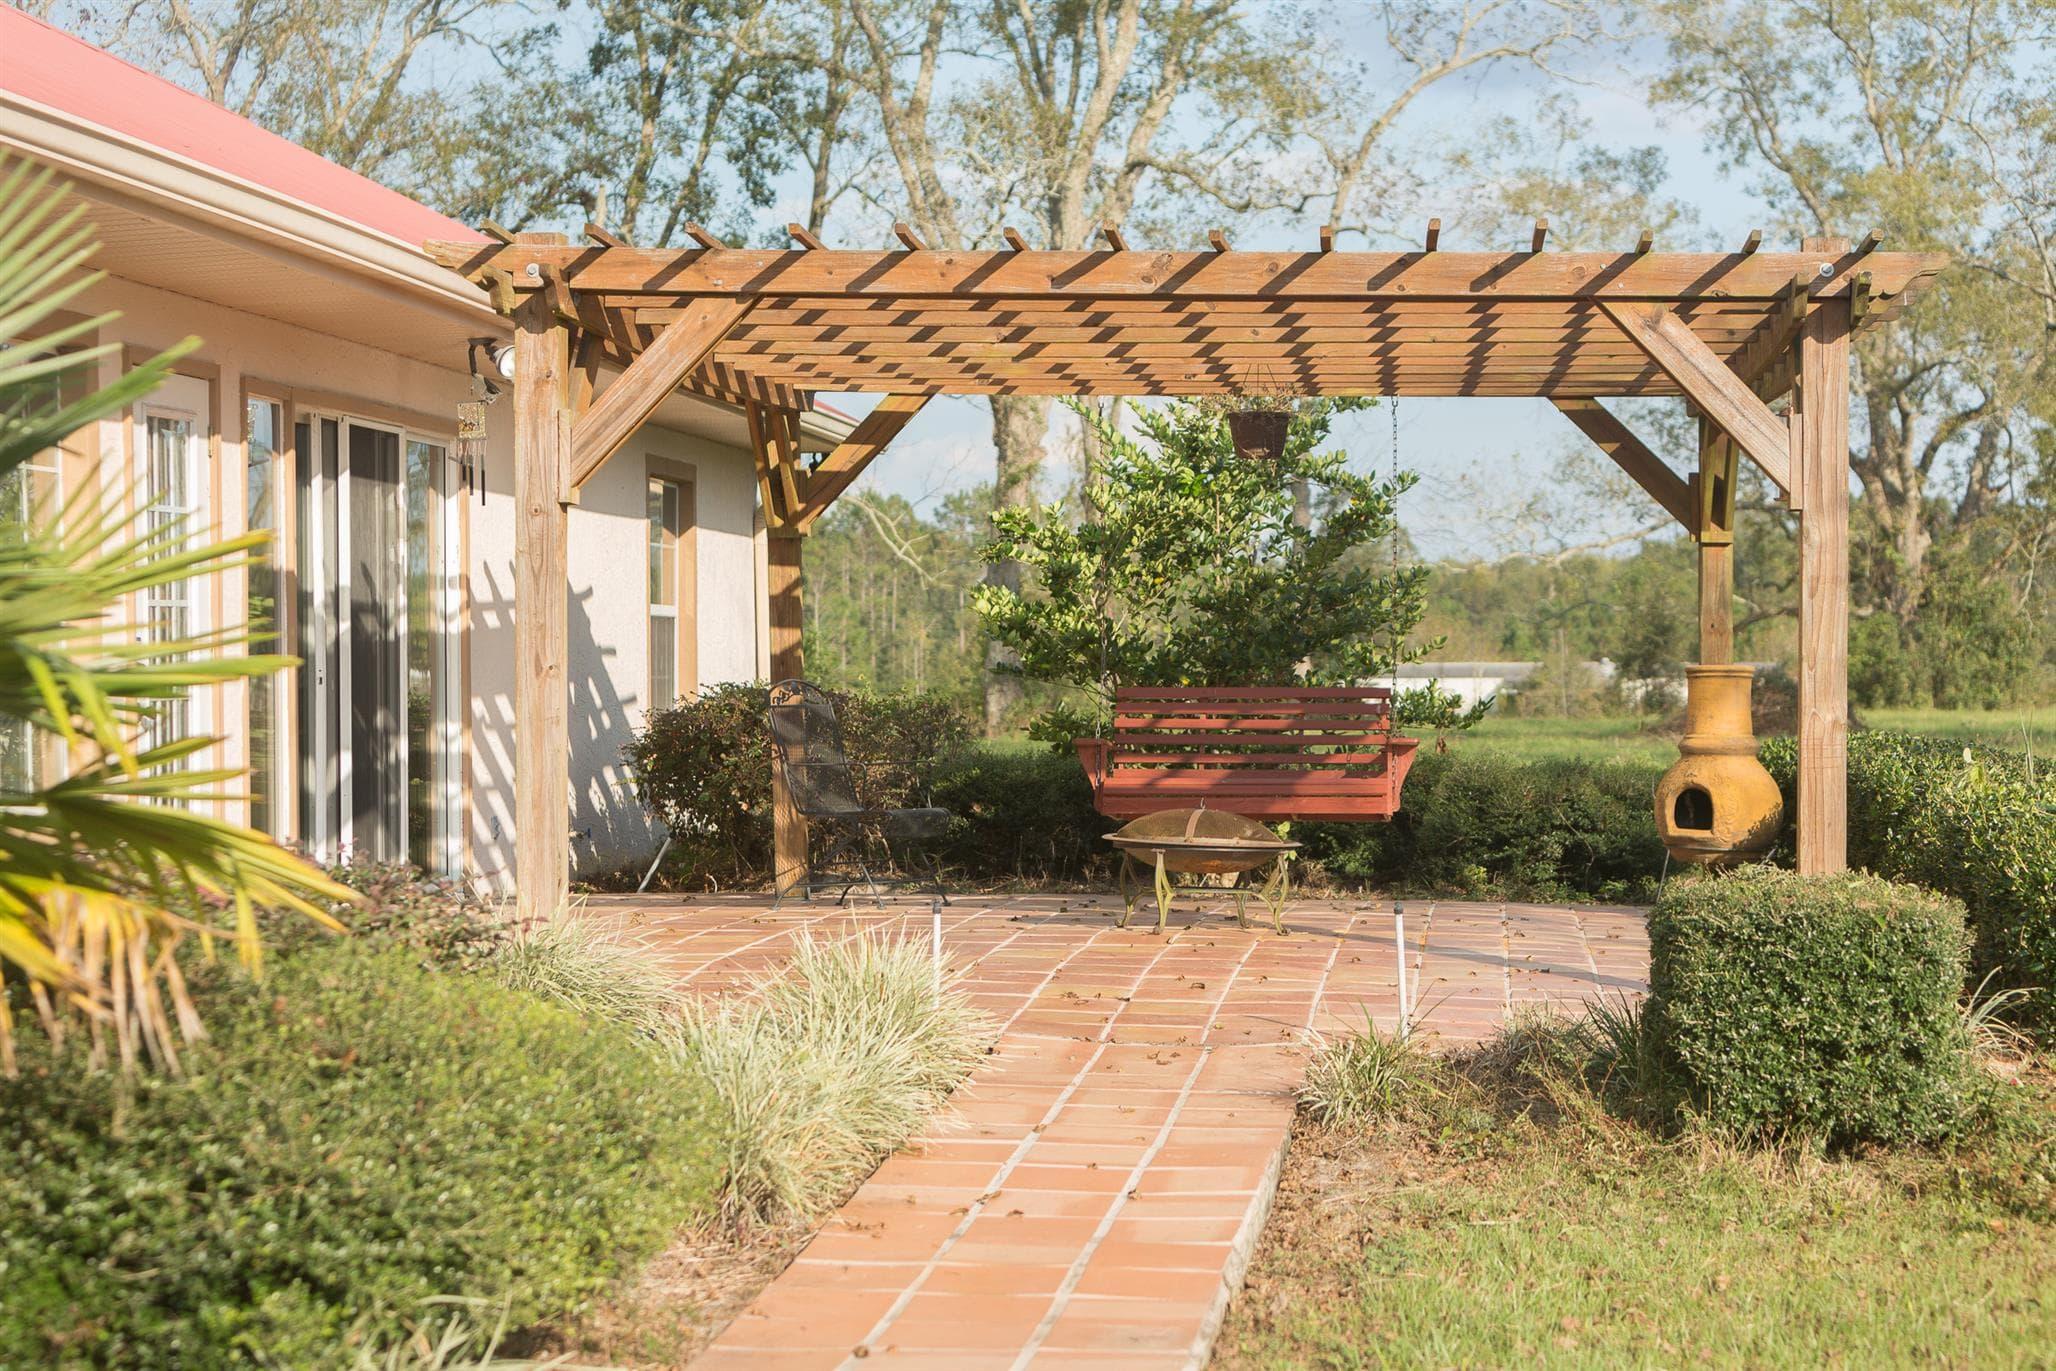 Stone terrace on spanish style home in Live Oak FL